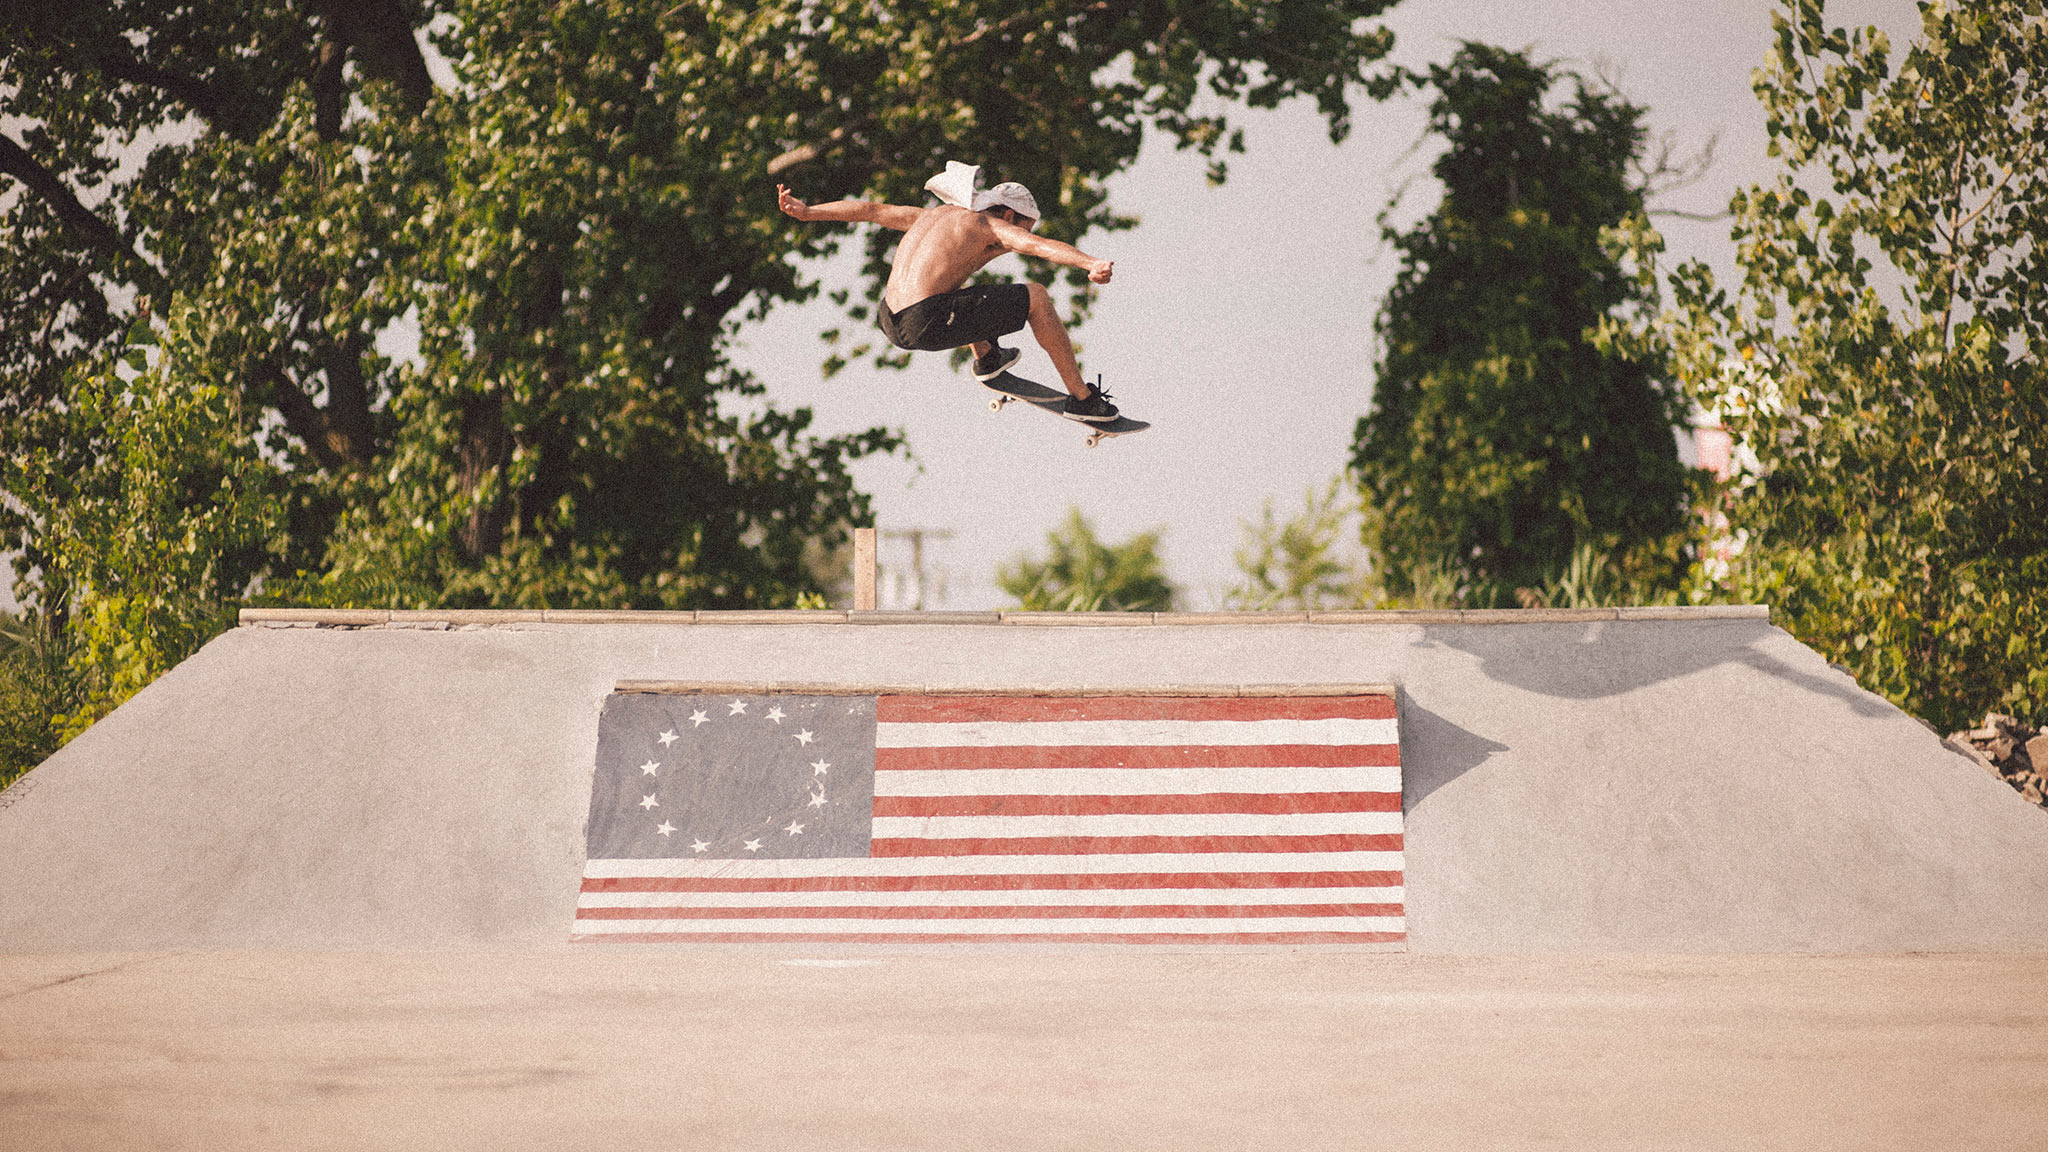 NJ Skateshop -- Silvester Eduardo